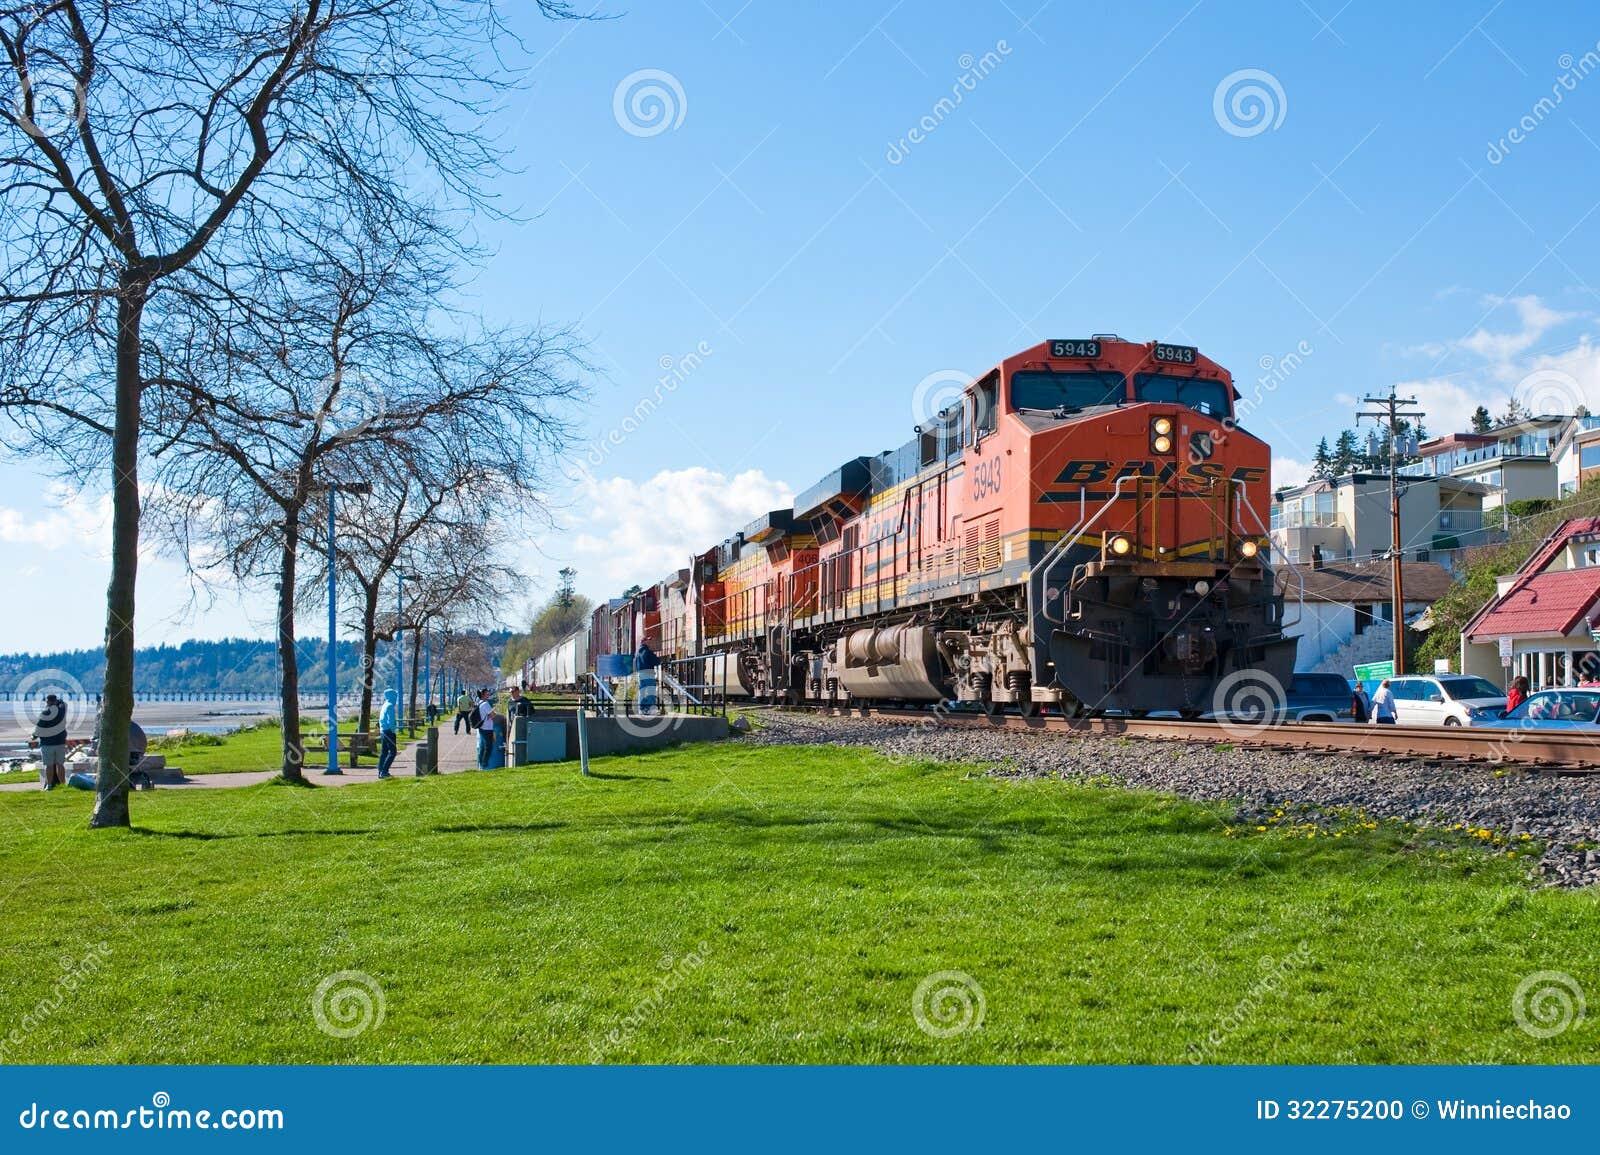 Berkshire Hathaway Energy Bnsf Coal Train Editorial Image Image Of Grade Engine